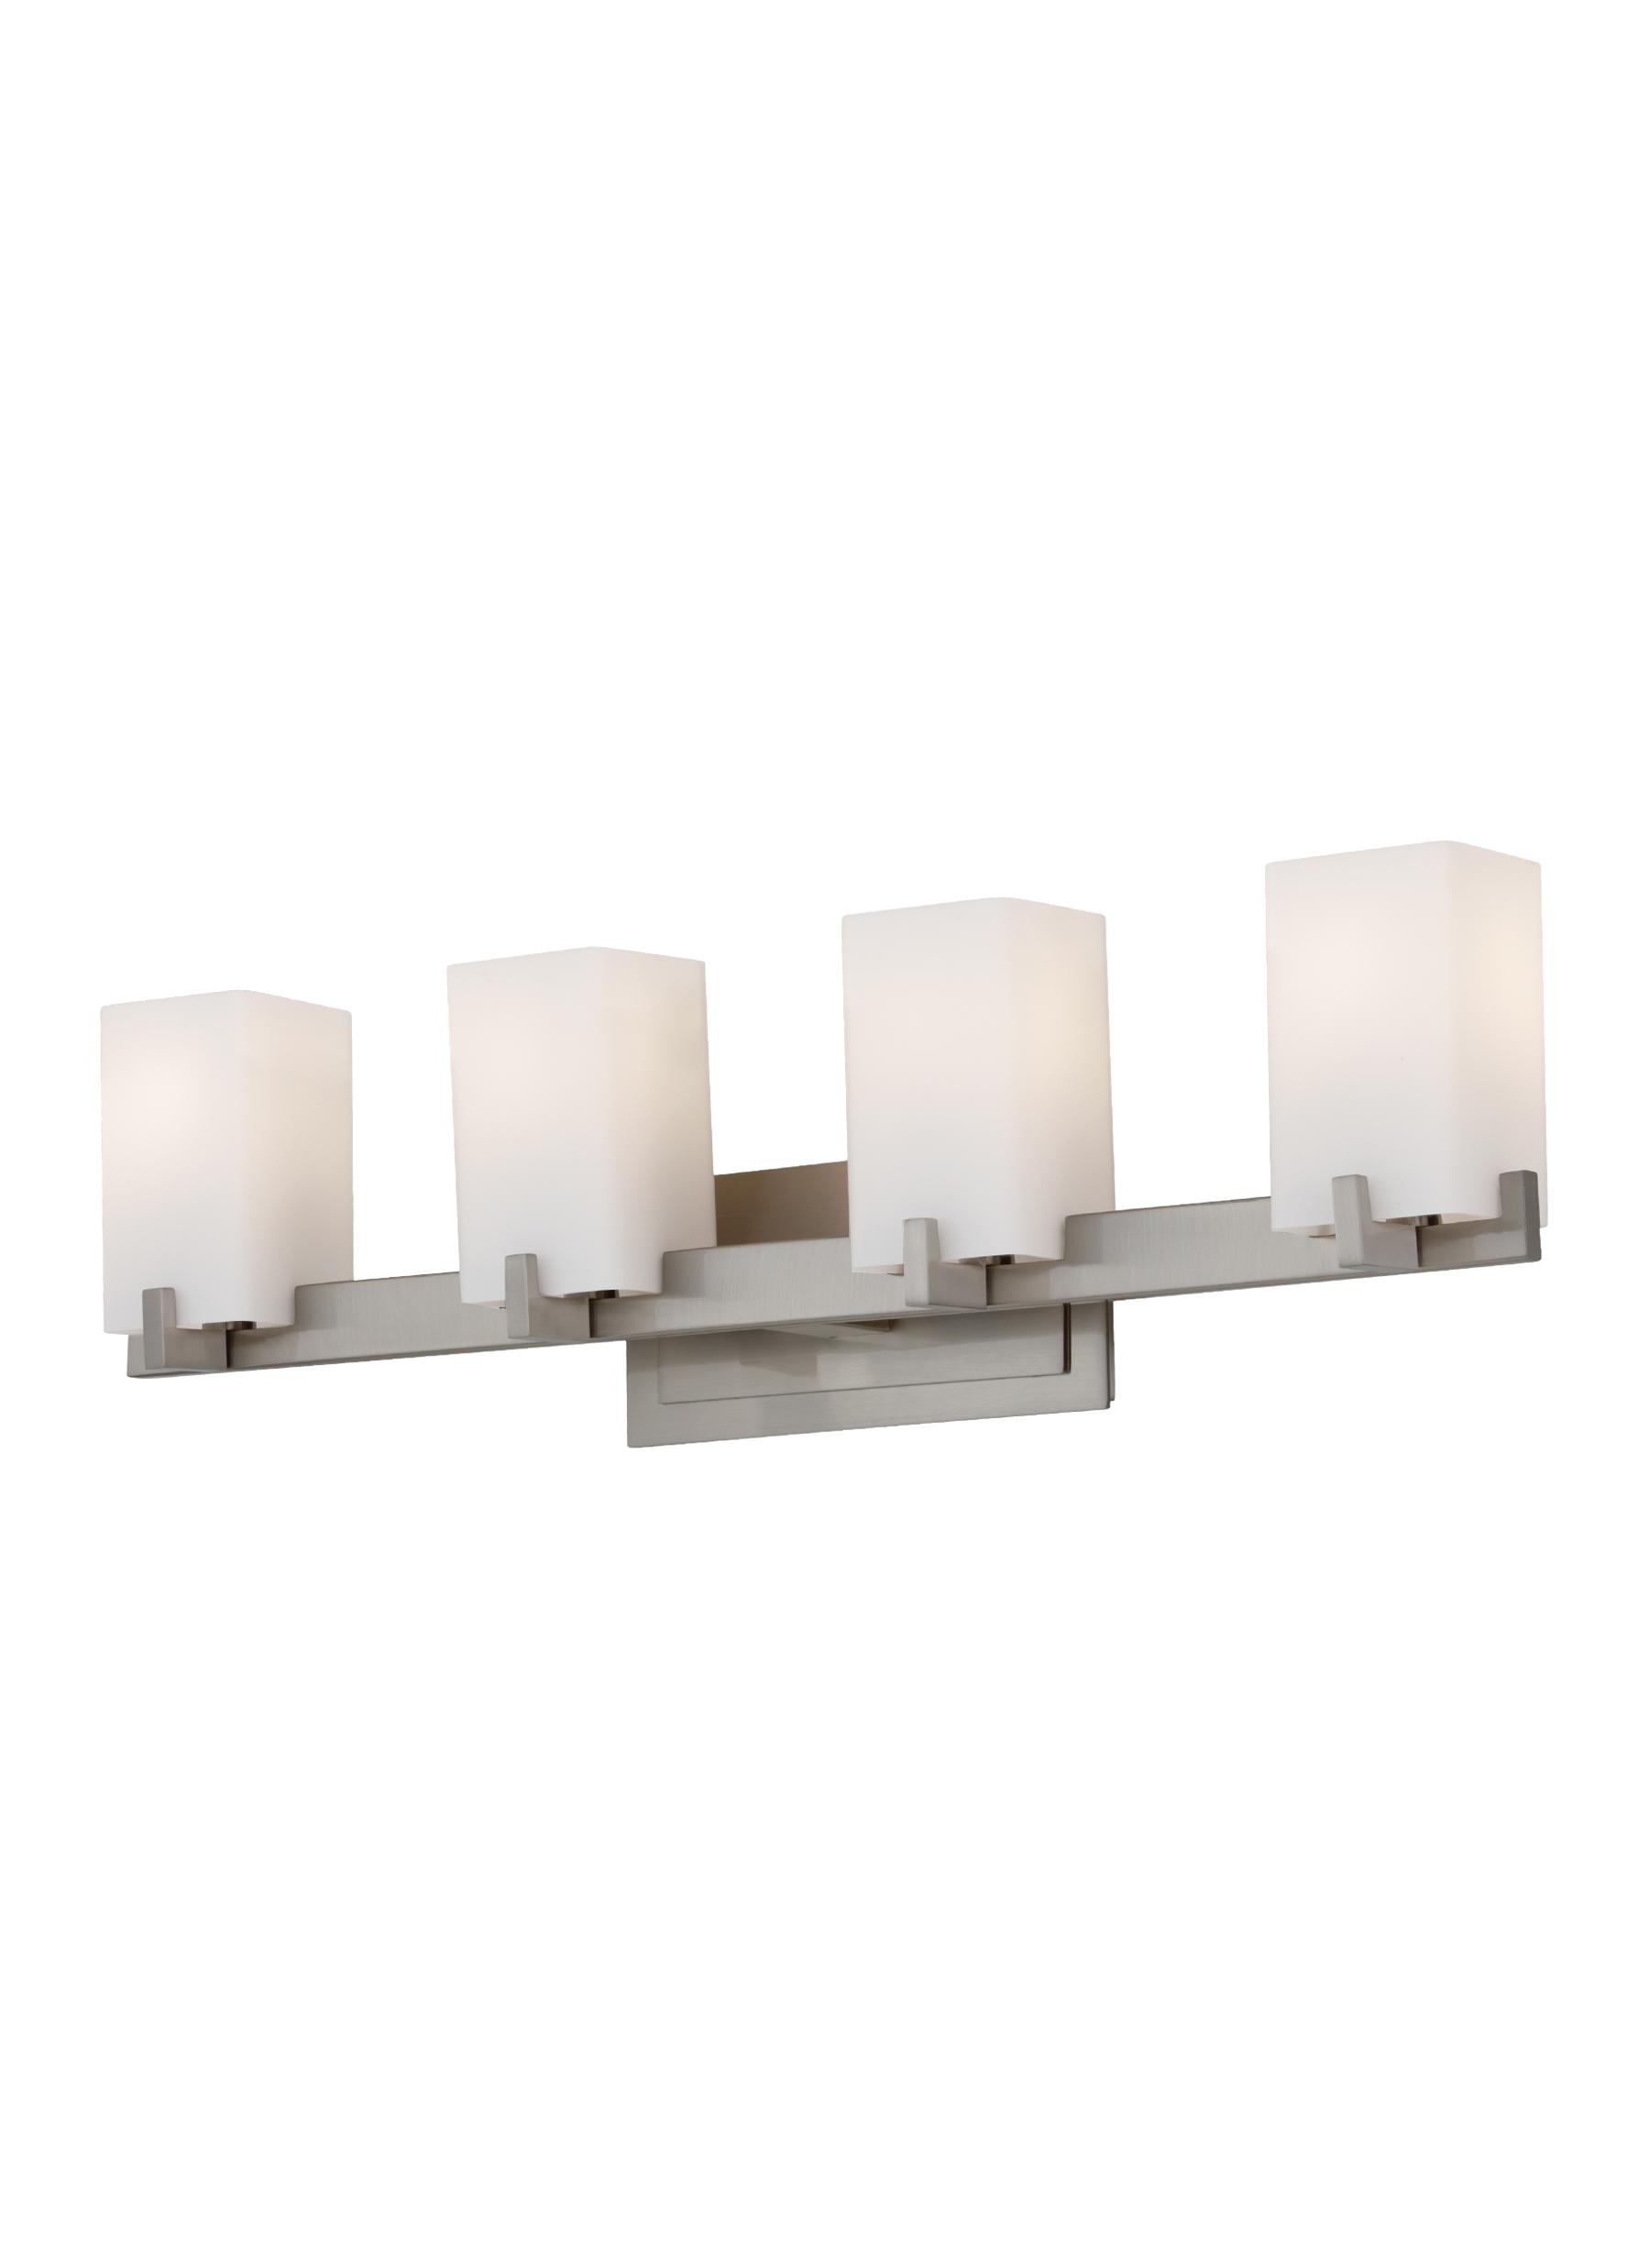 Vs18404 bs4 light vanity fixturebrushed steel loading zoom aloadofball Images